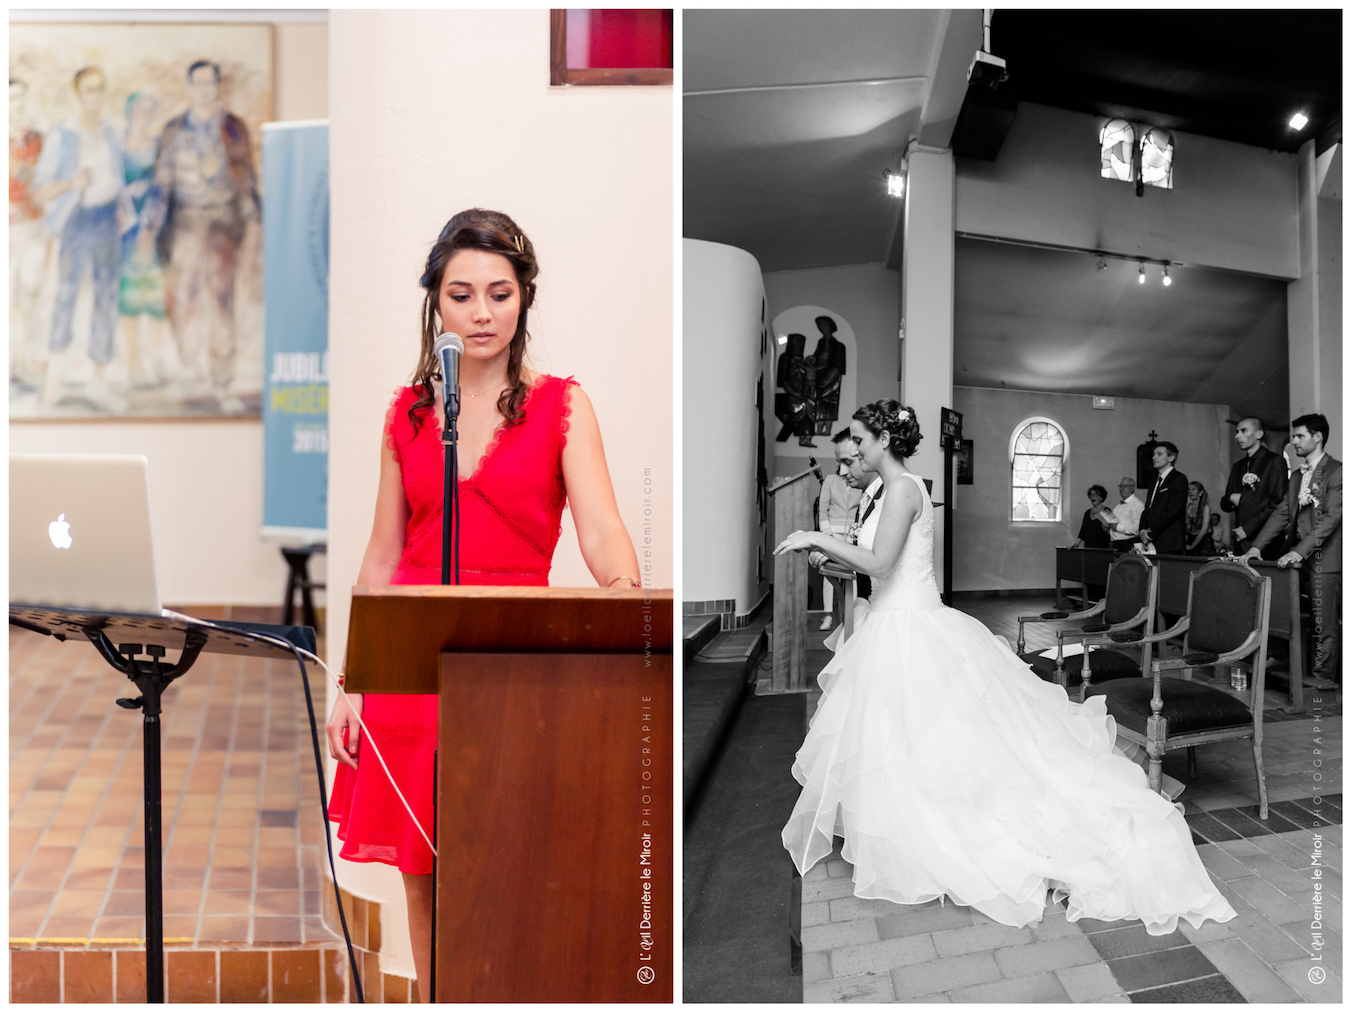 photographe-mariage-06-chateau-vaugrenier-11